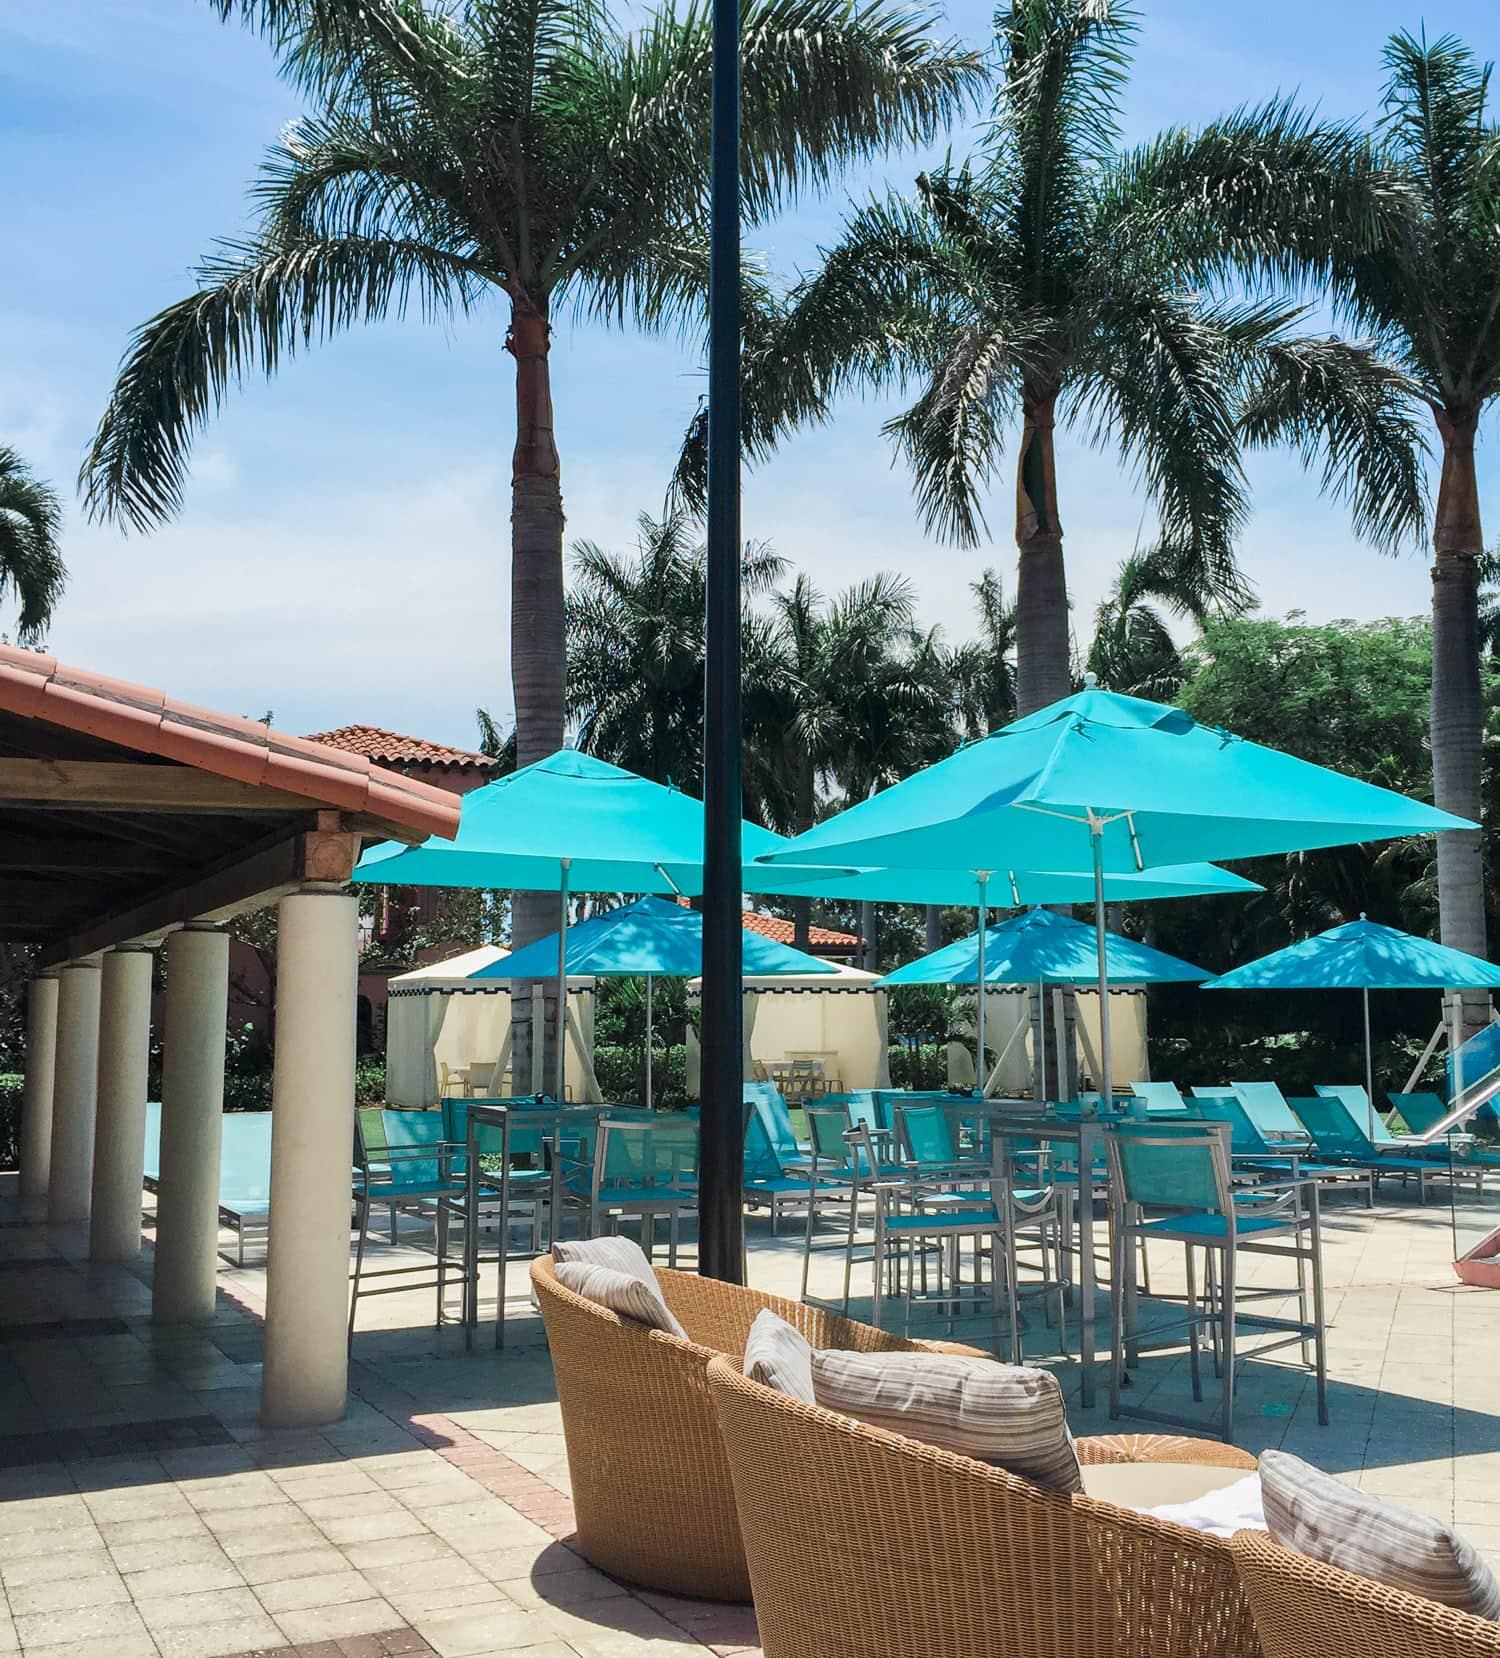 Pool area at the Boca Raton Resort + A full review of the Boca Raton Resort & Club by blogger Ashley Brooke Nicholas